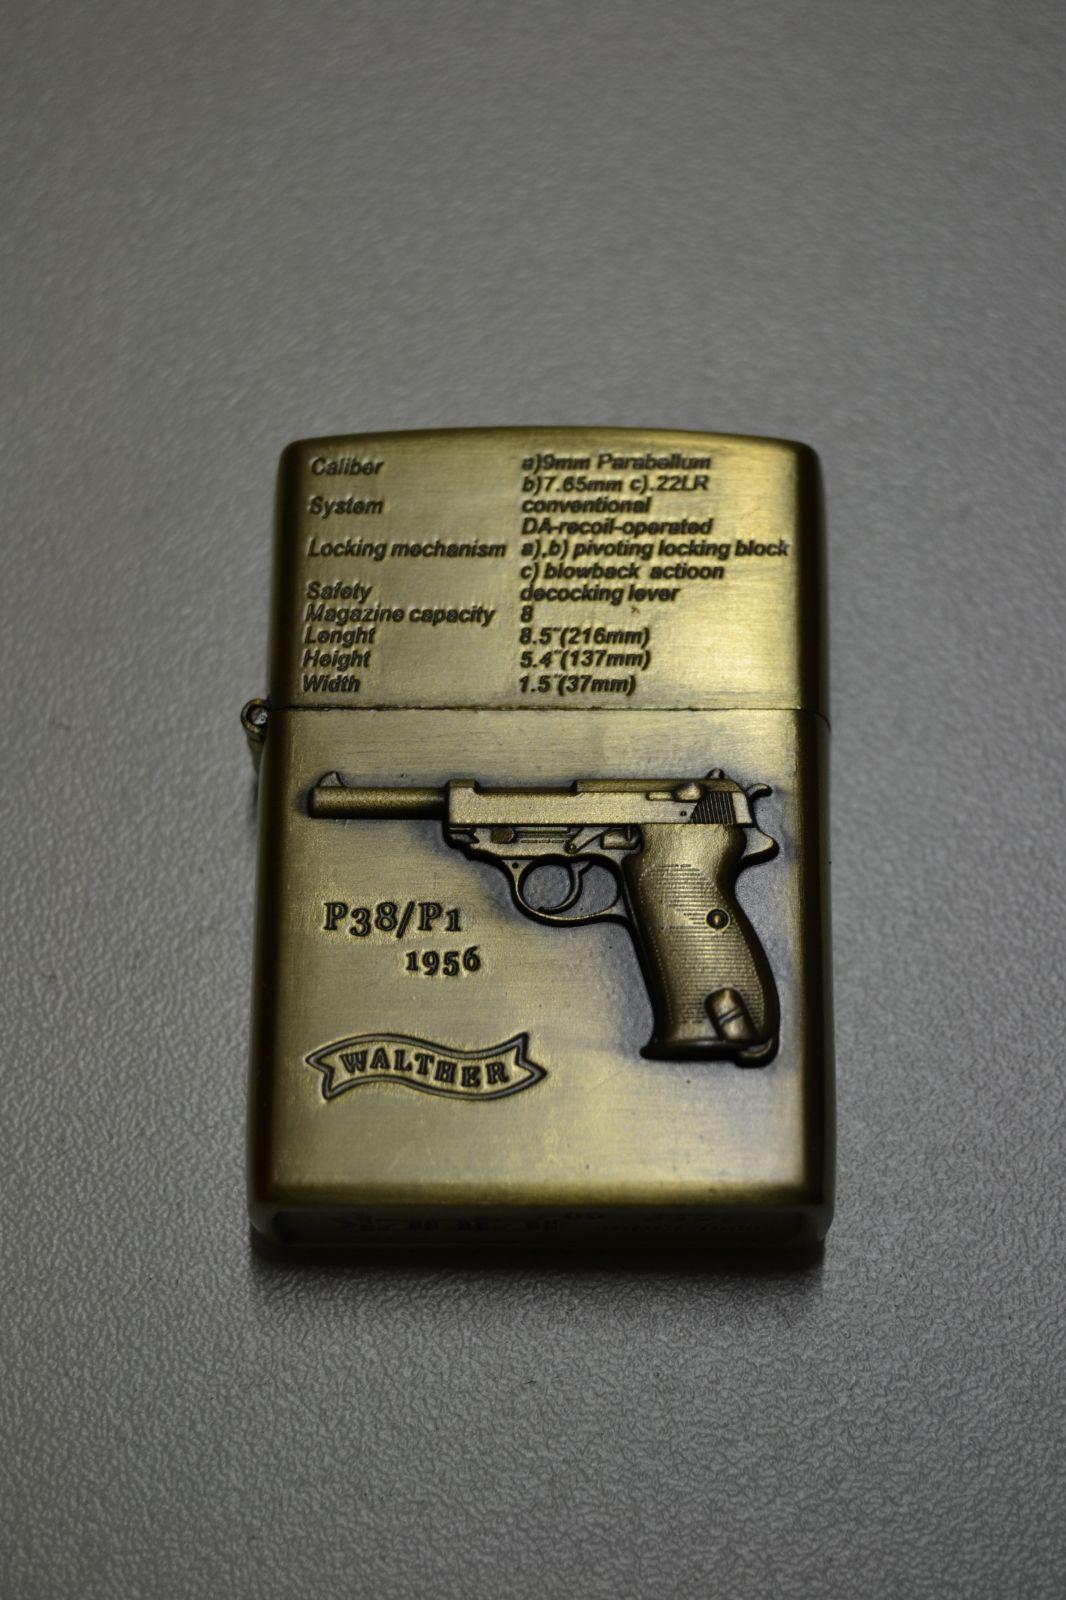 BENZÍNOVÝ ZAPALOVAČ Č.8 - pistole walther P38/P1 1956